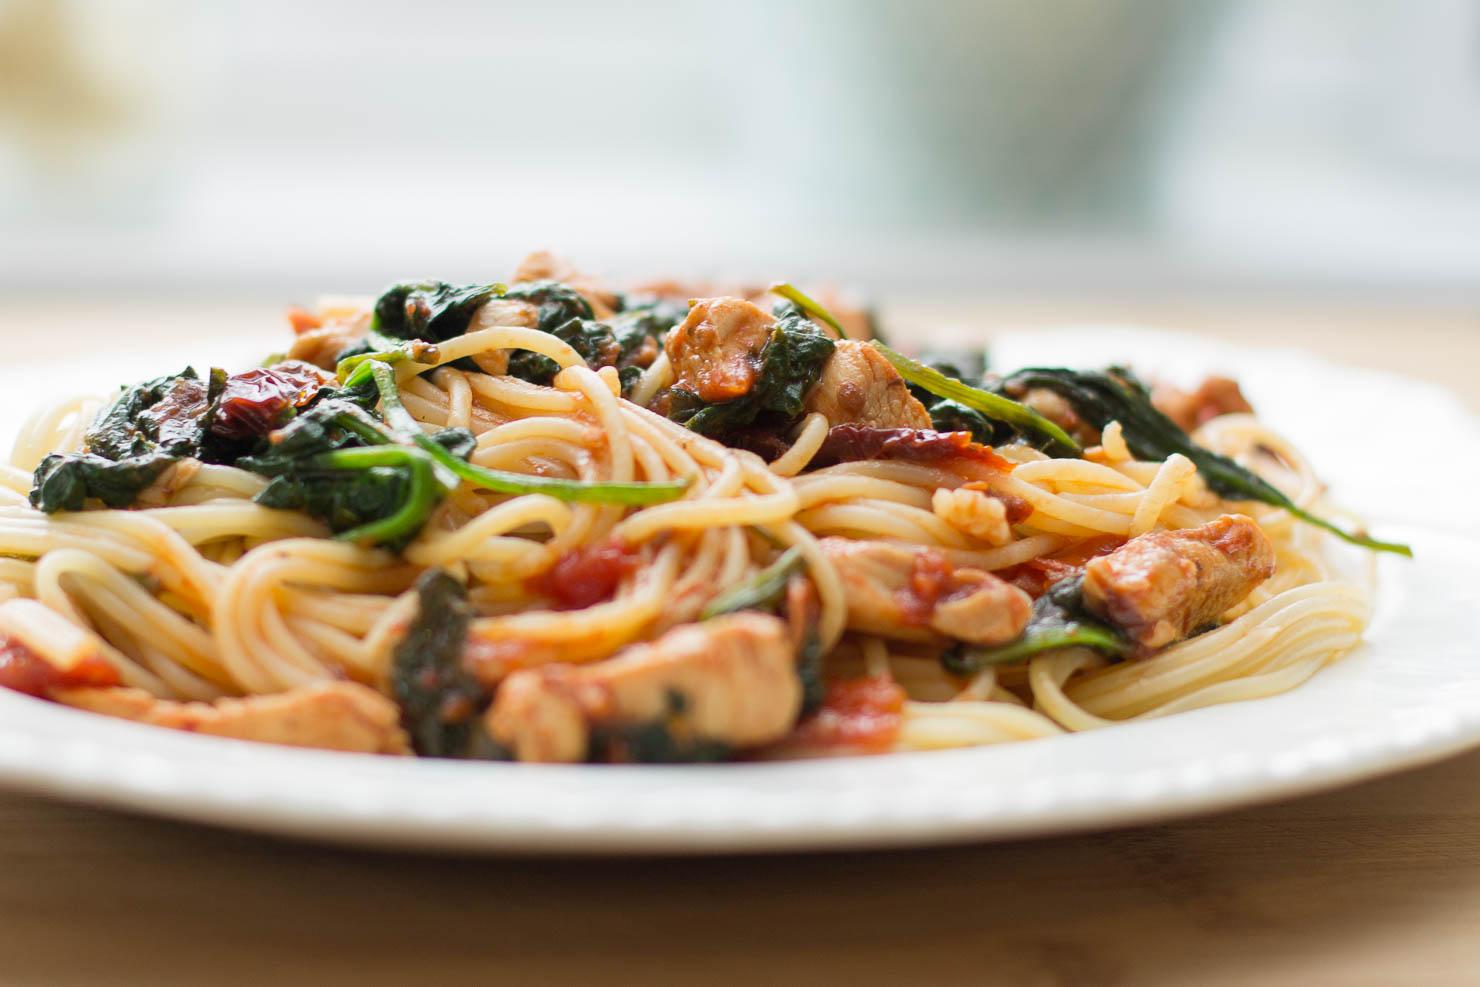 Closeup | Spaghetti med kylling, soltørkede tomater og spinat